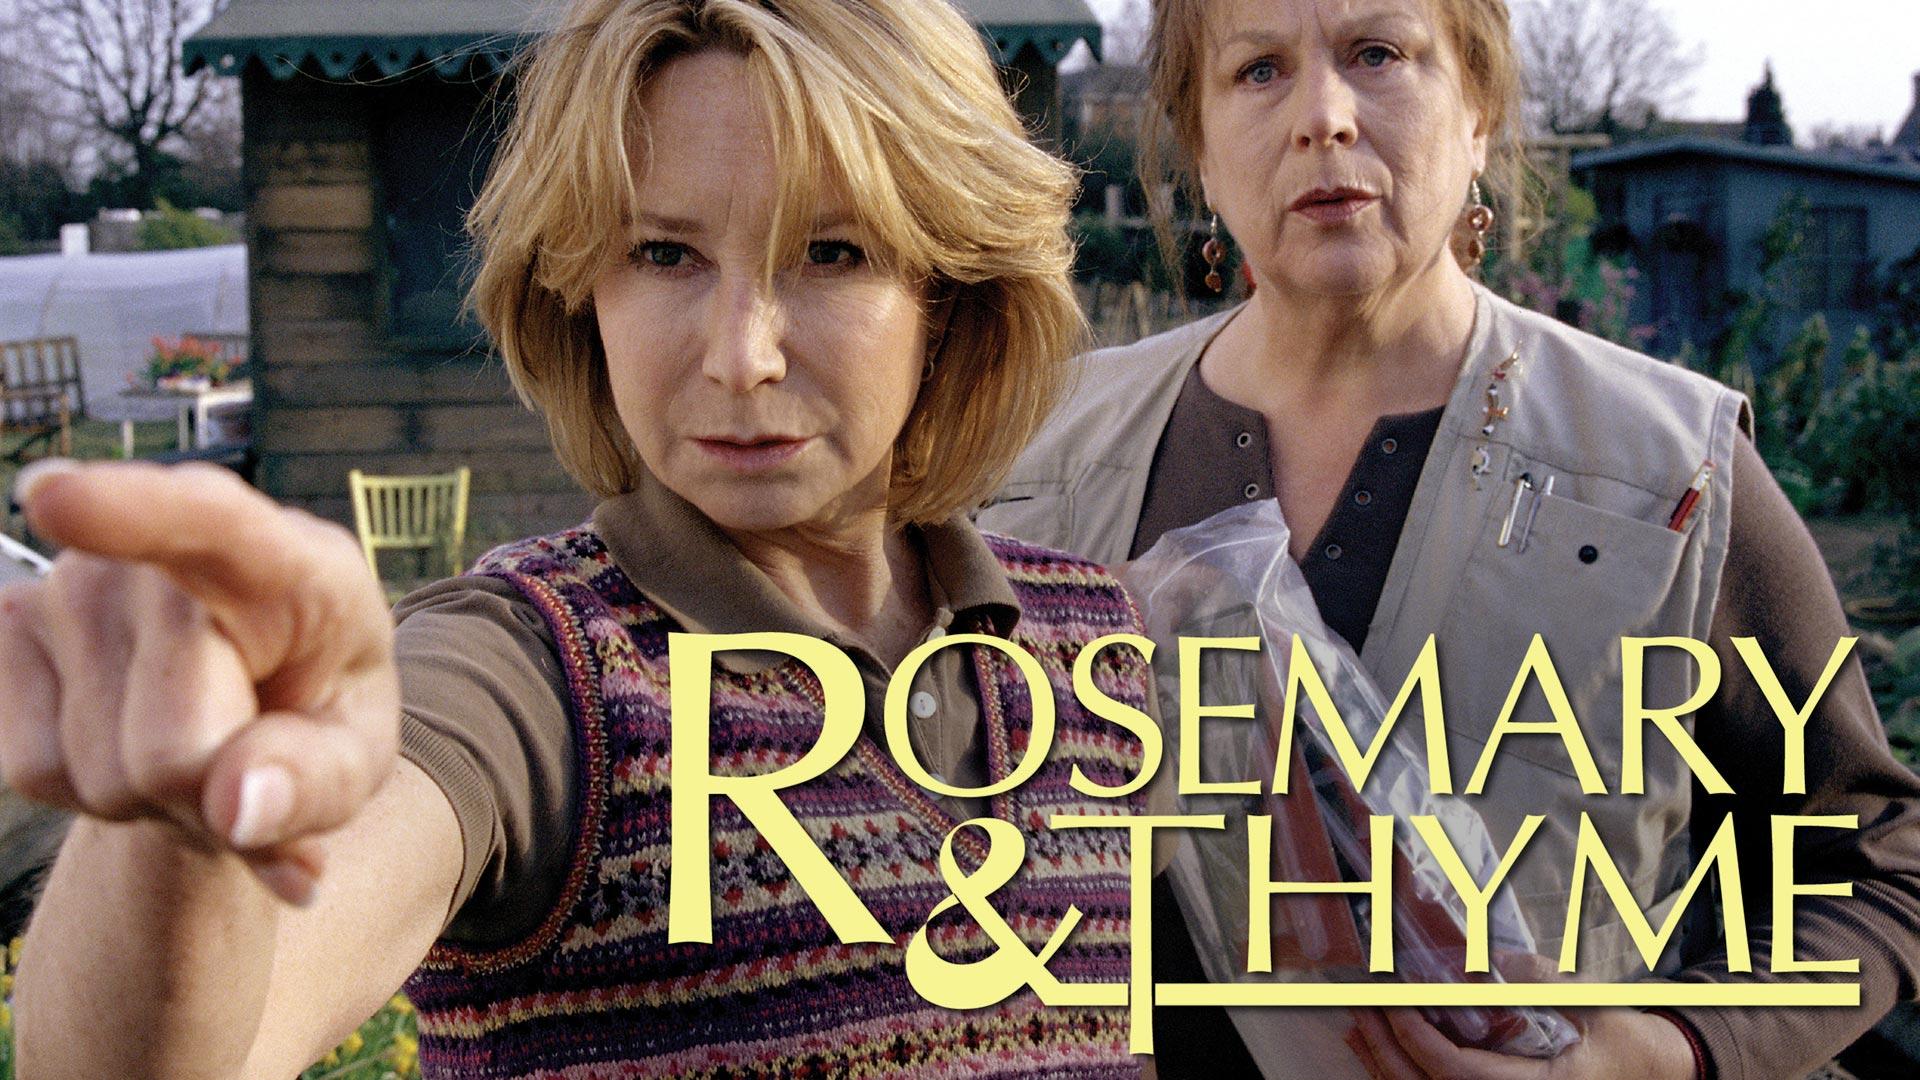 Rosemary And Thyme, Season 1